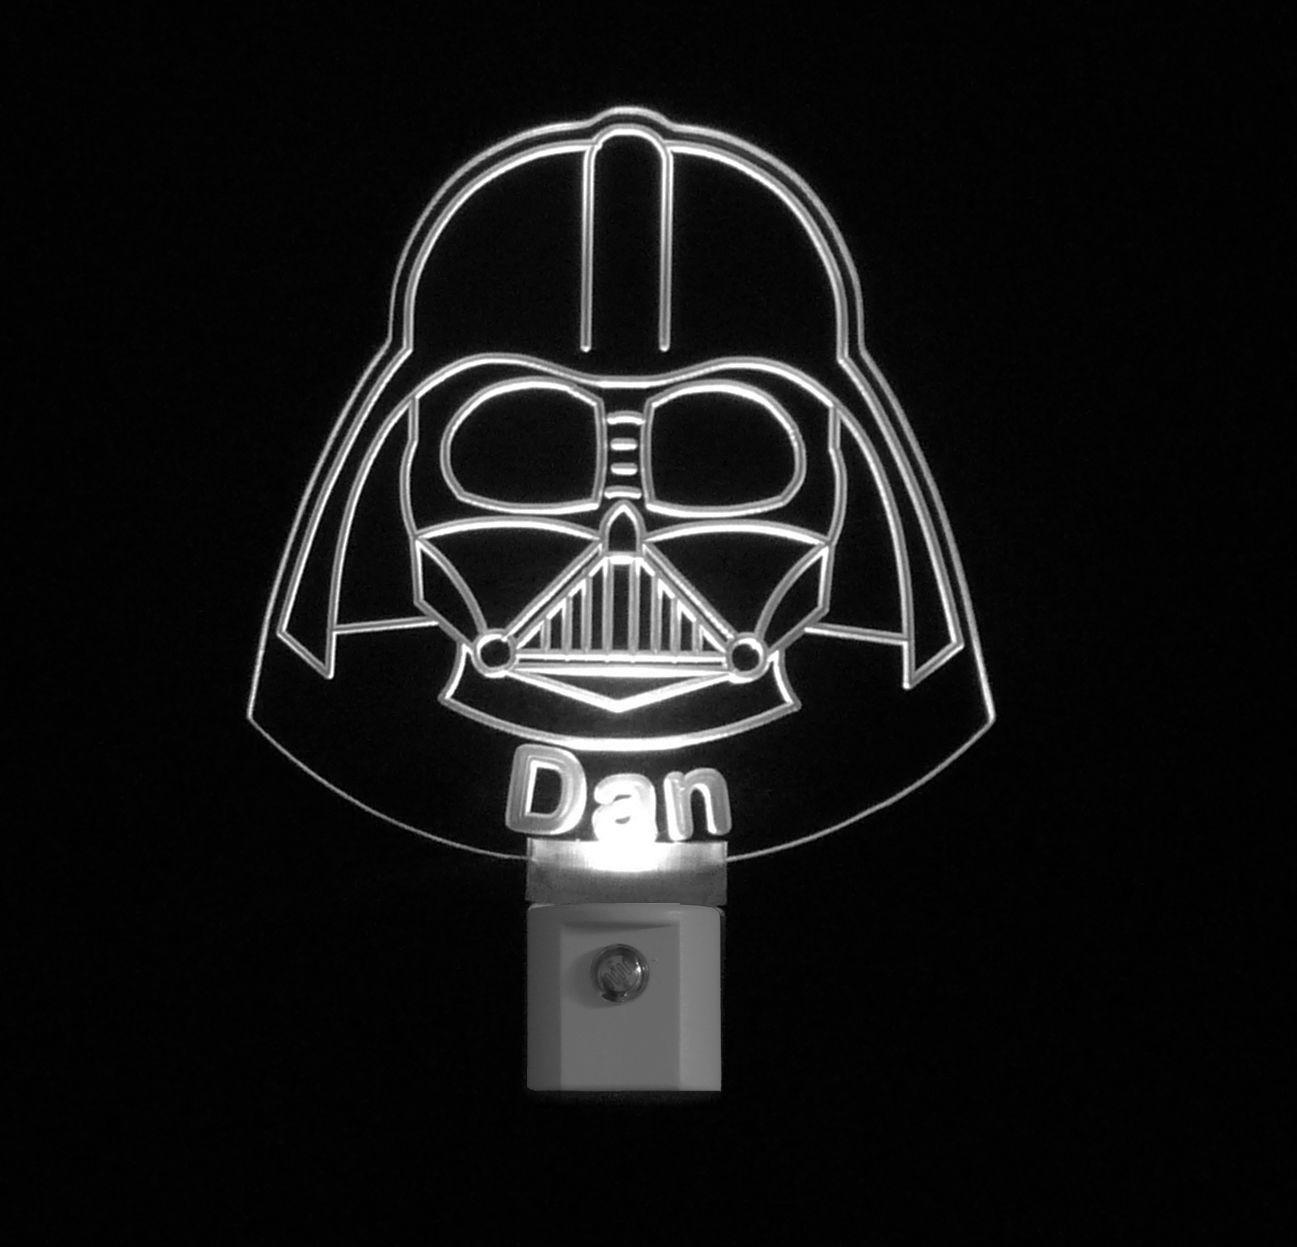 Star Wars Darth Vader Personalized LED Night Light, Handmade, Man Cave -Gift